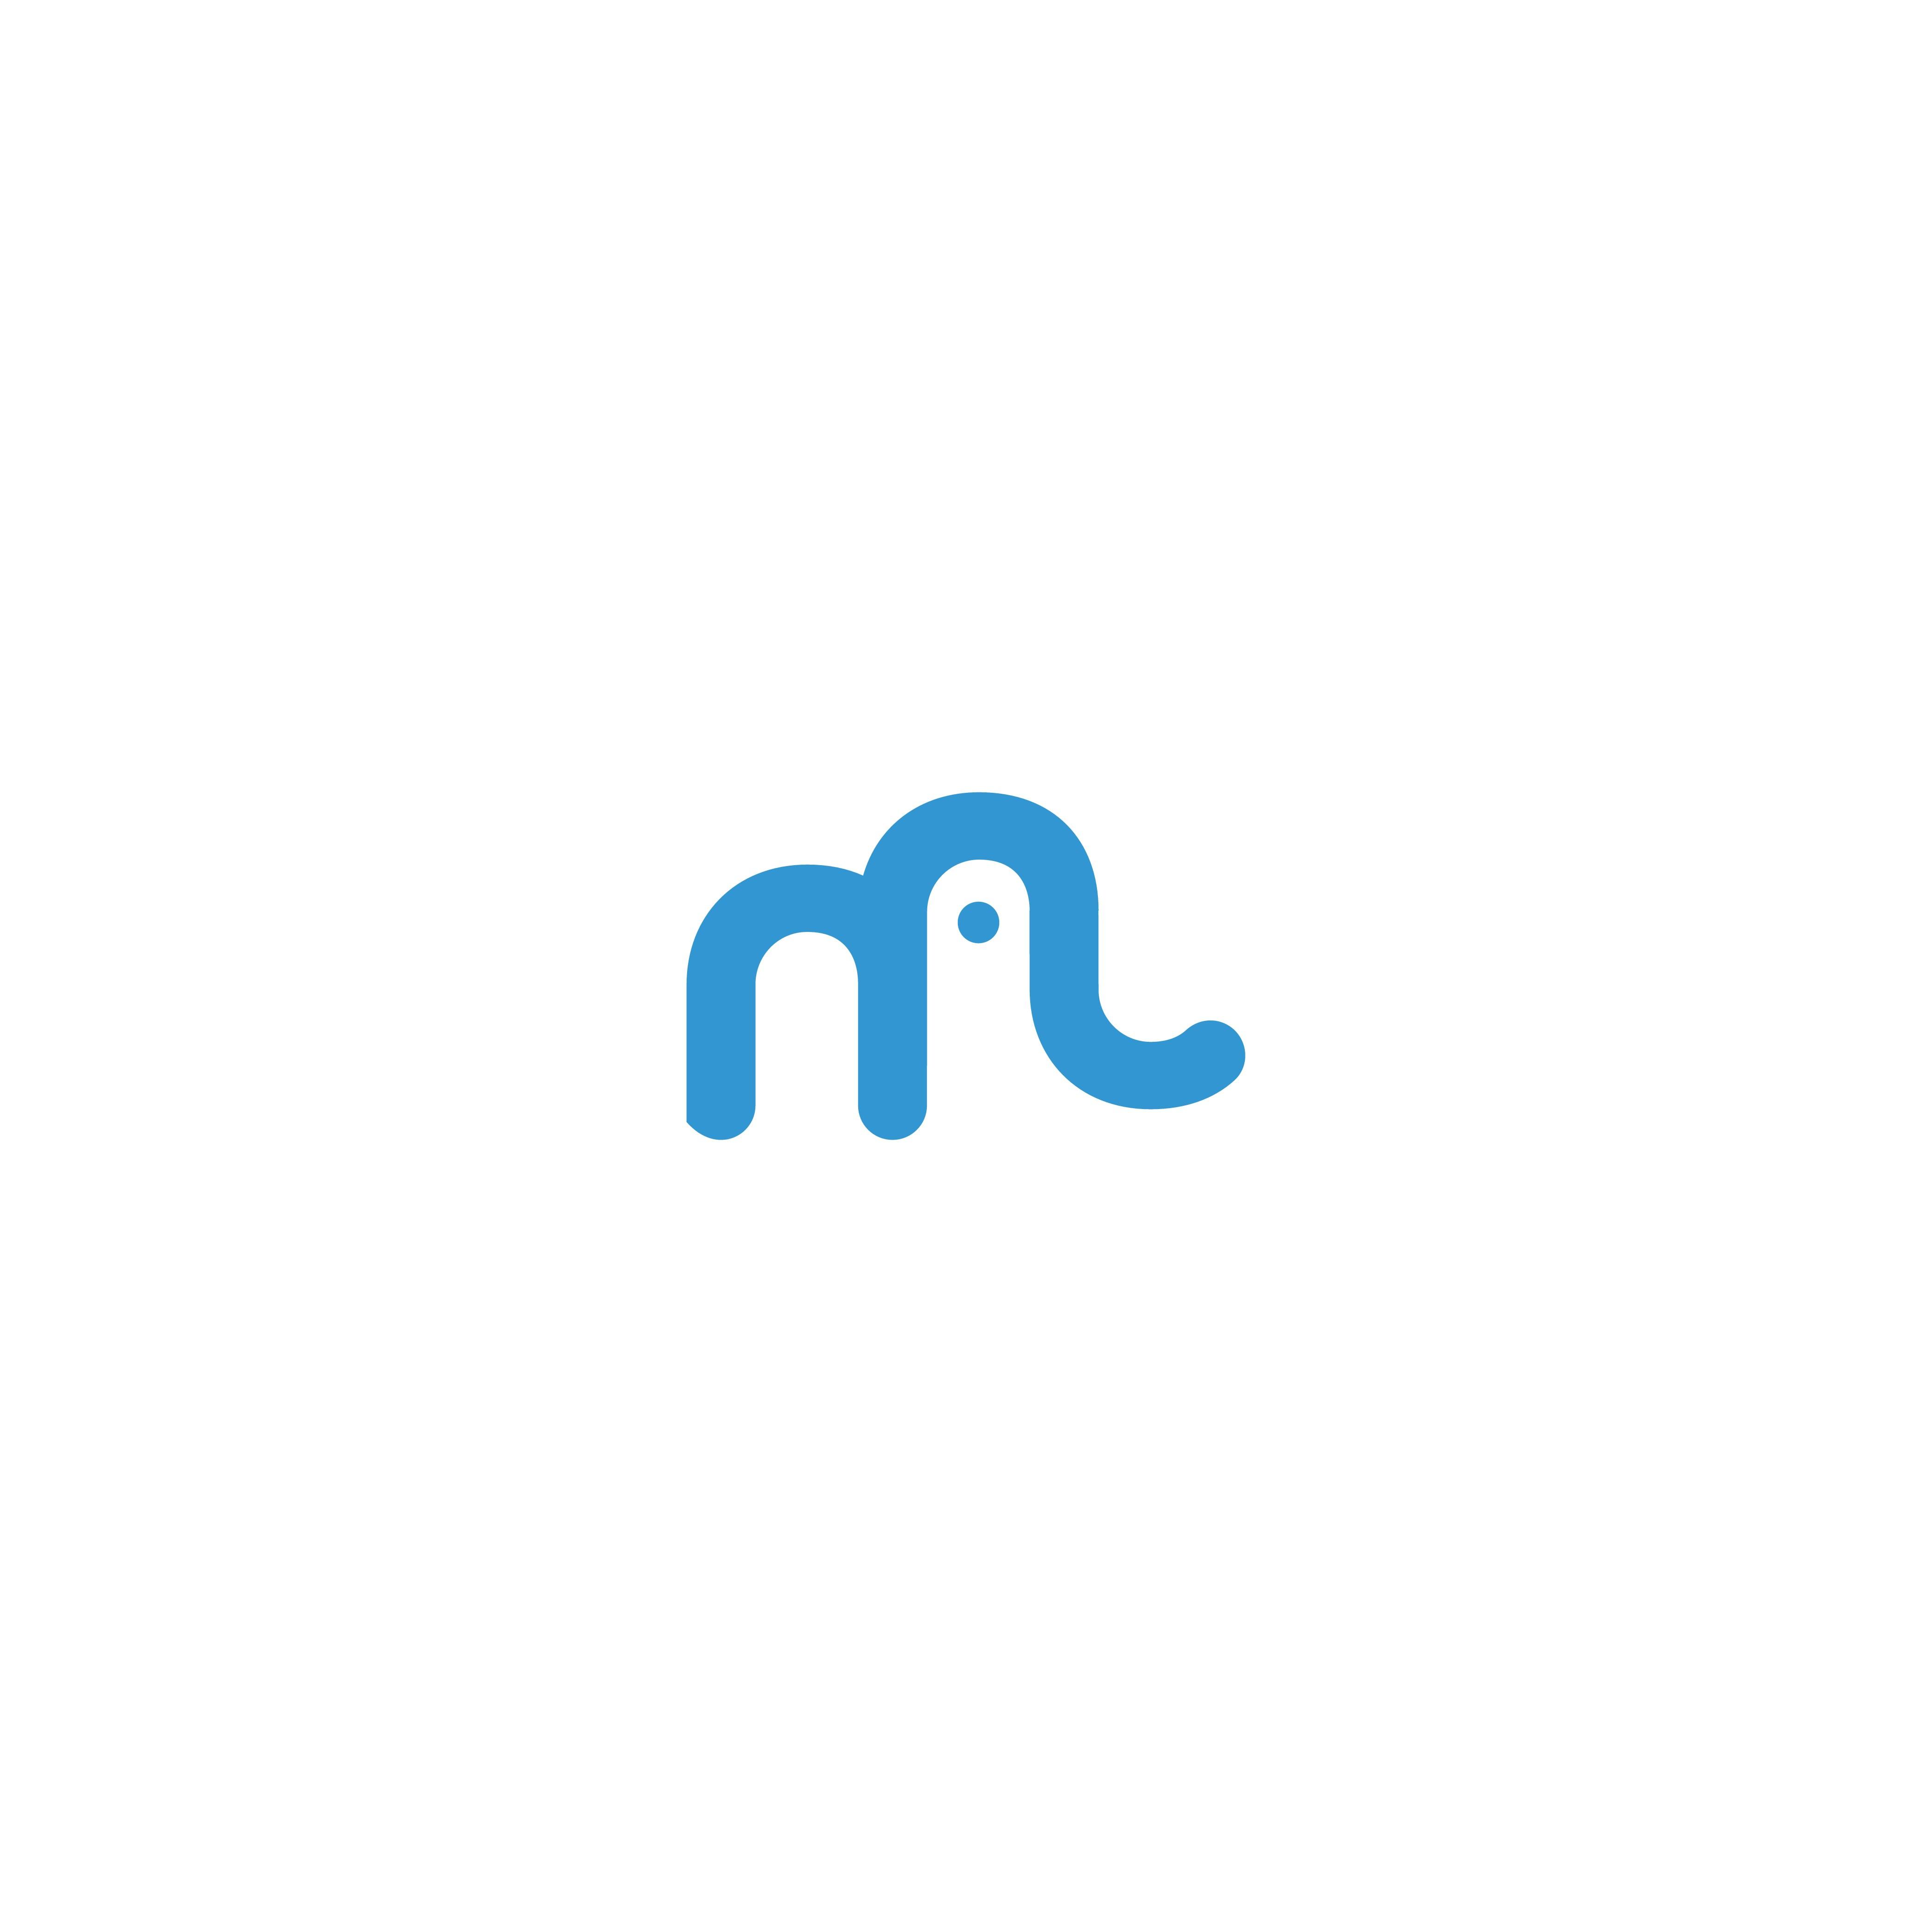 Design a logo for a technology startup